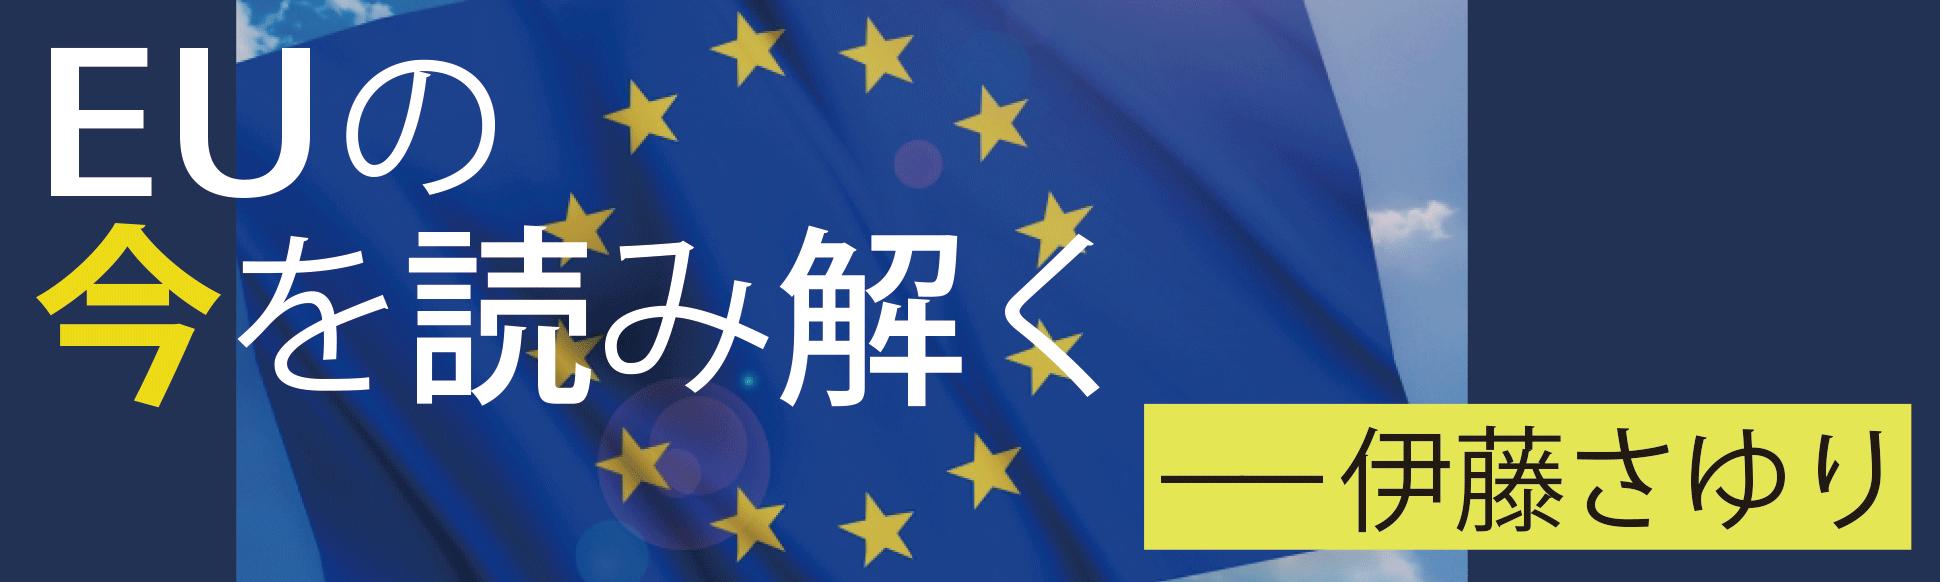 6:EUの今を読み解く